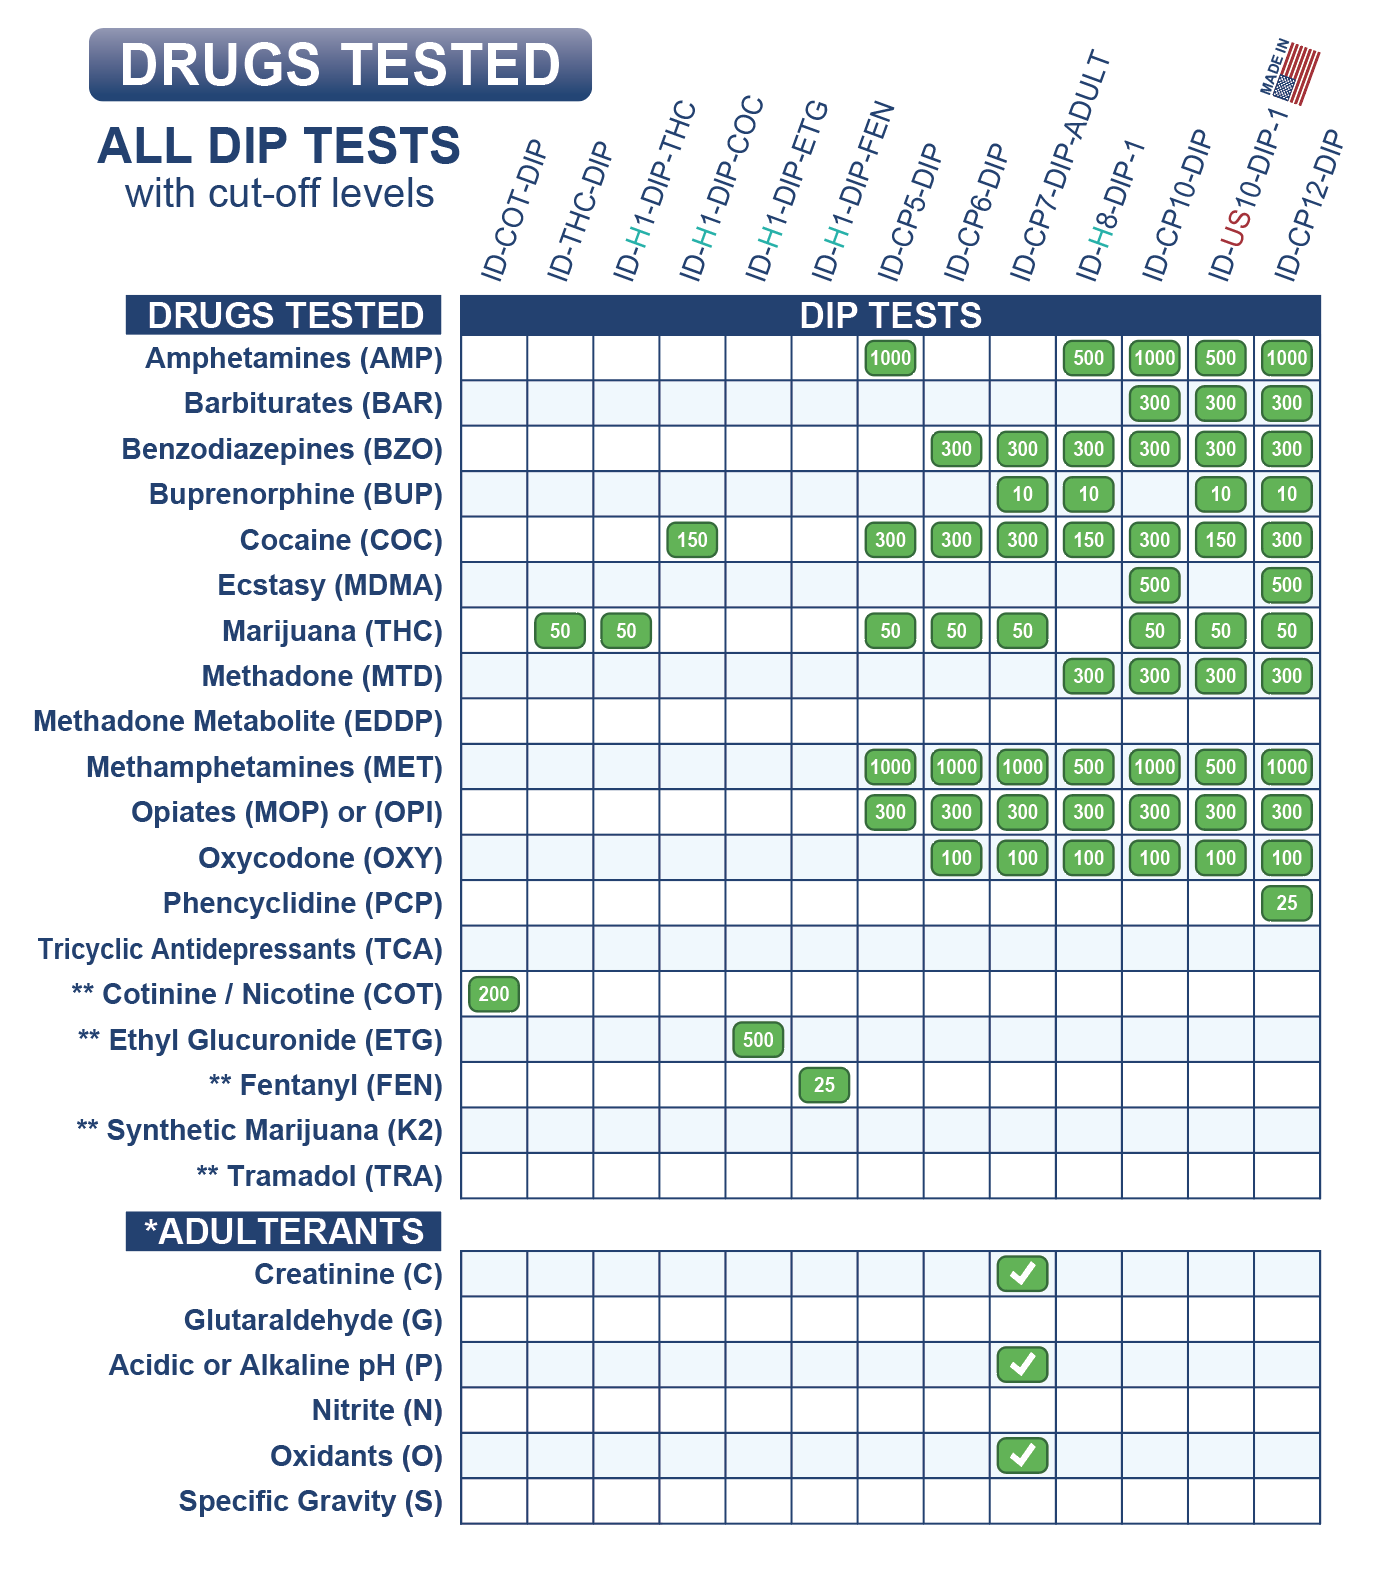 identify-diagnostics-usa-health-drug-test-dip-list-may-2019.jpg